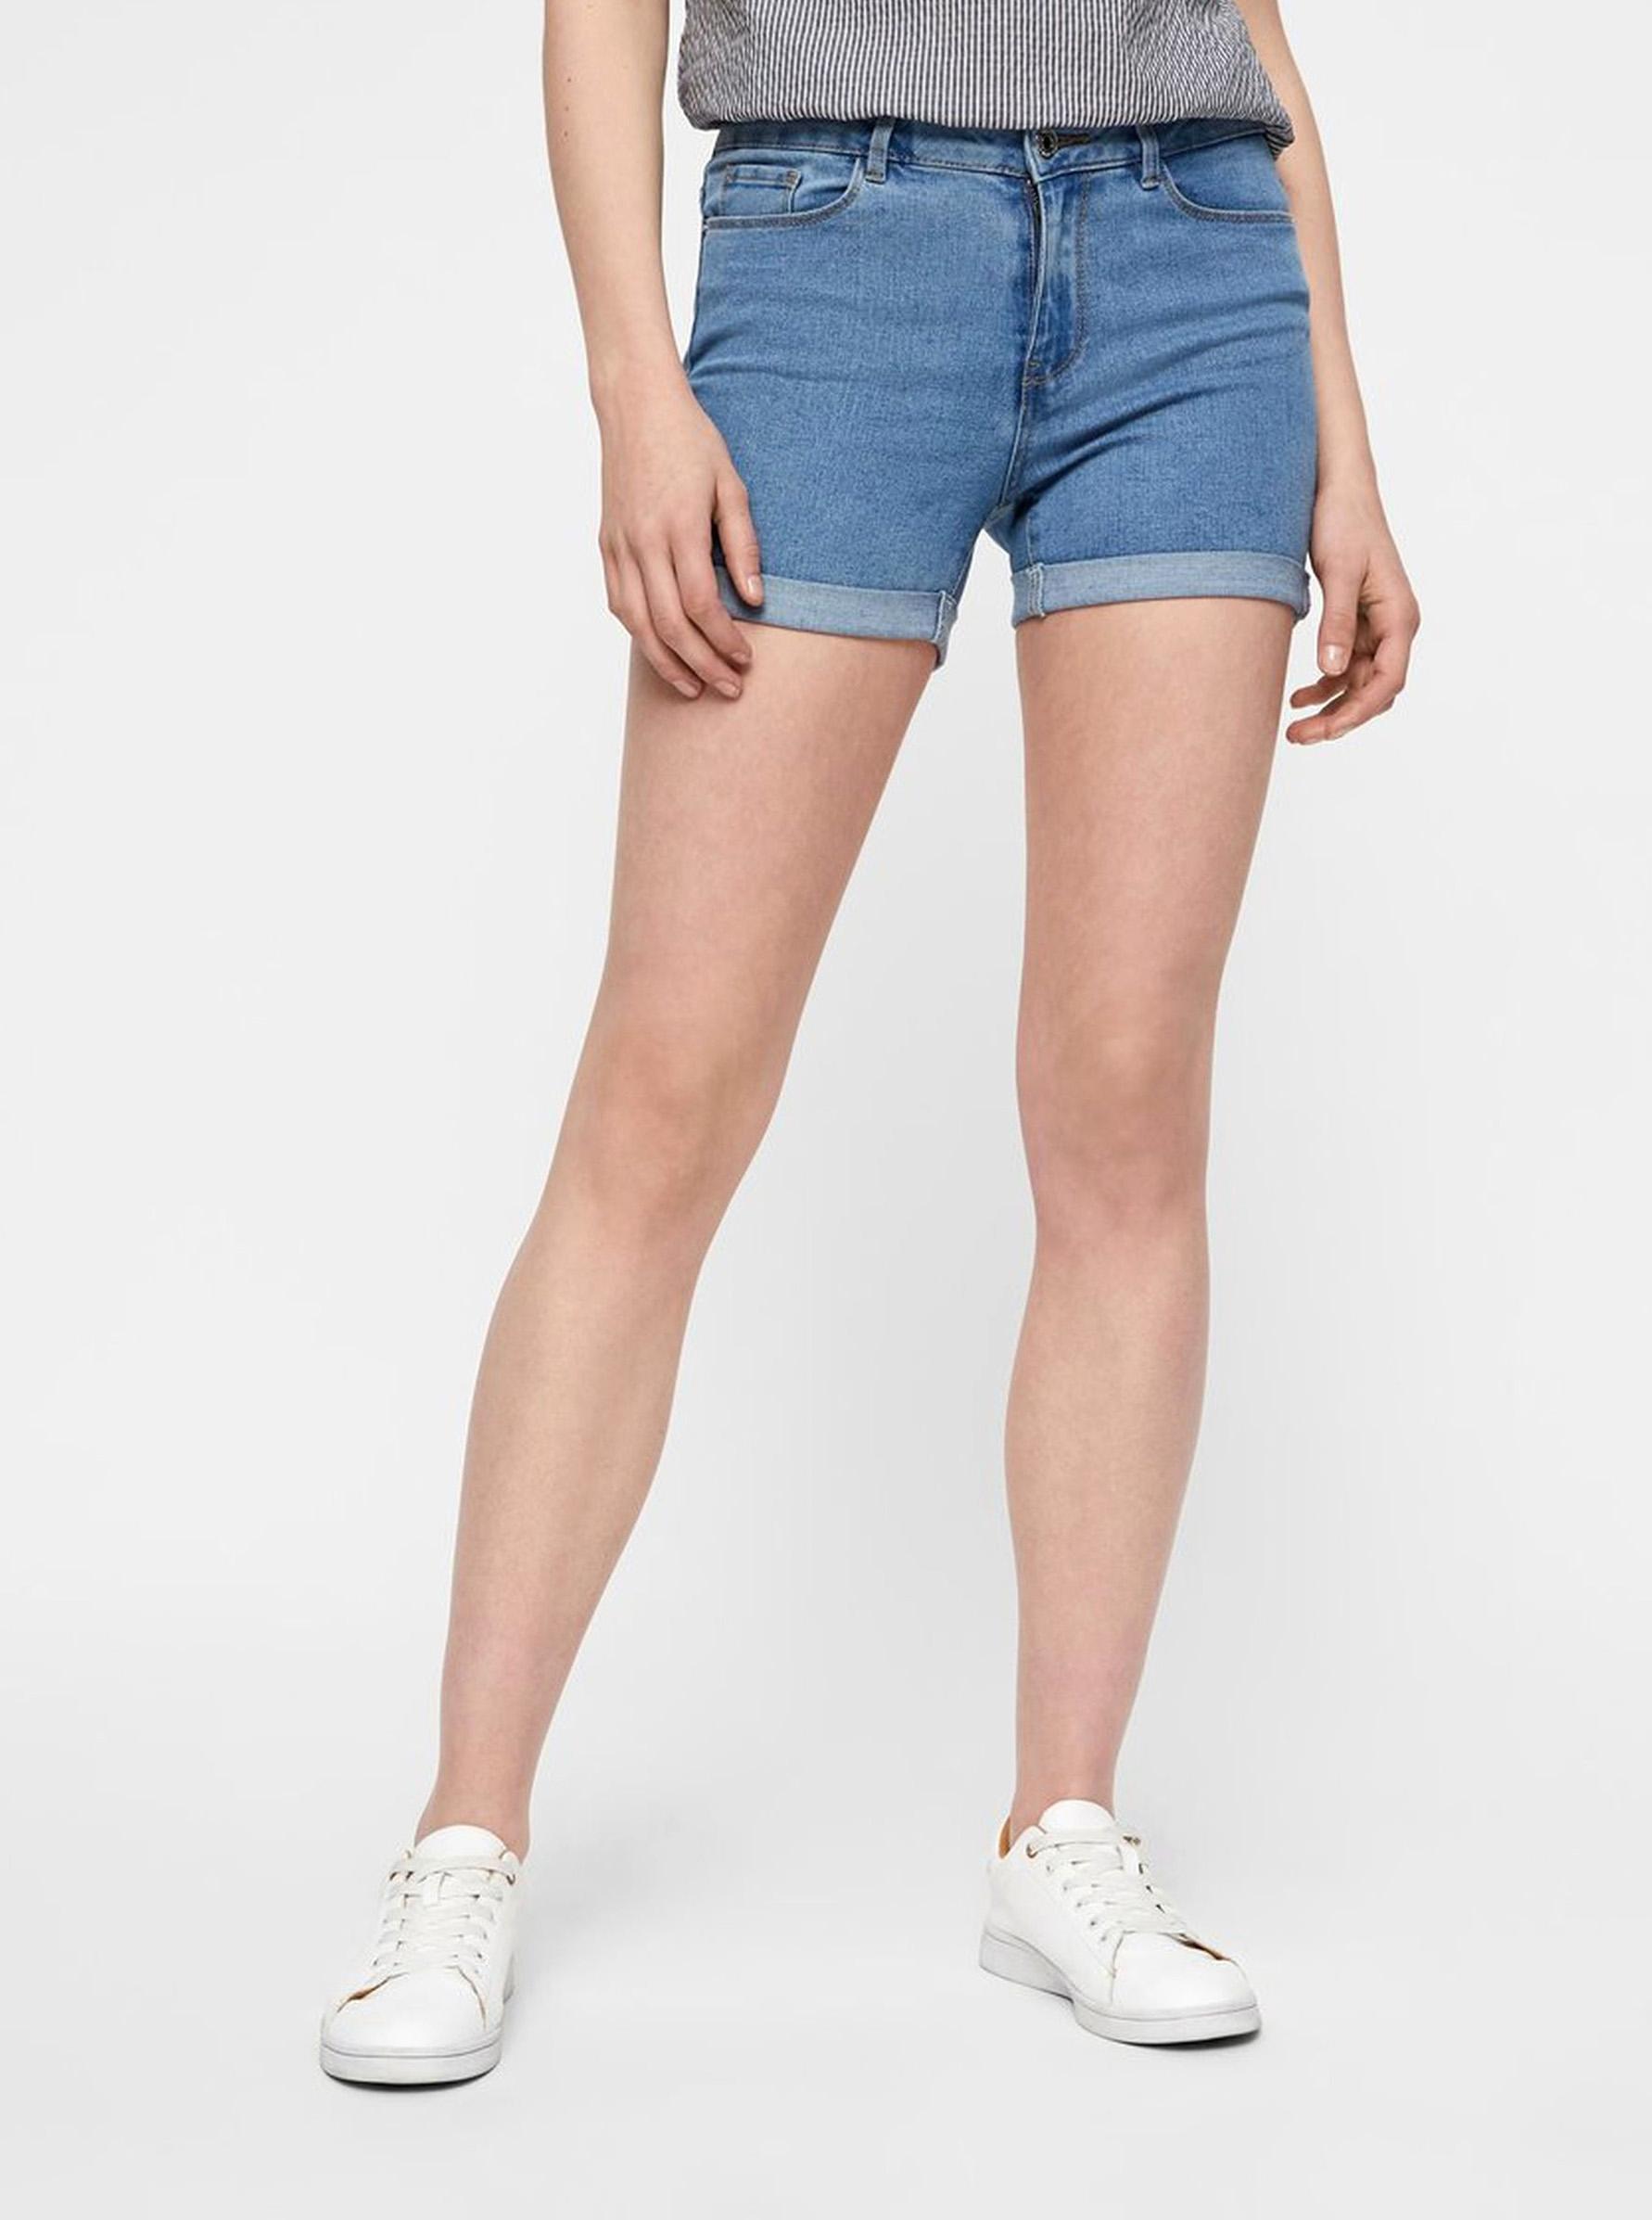 Vero Moda modré džínsové kraťasy Hot Seven - XS